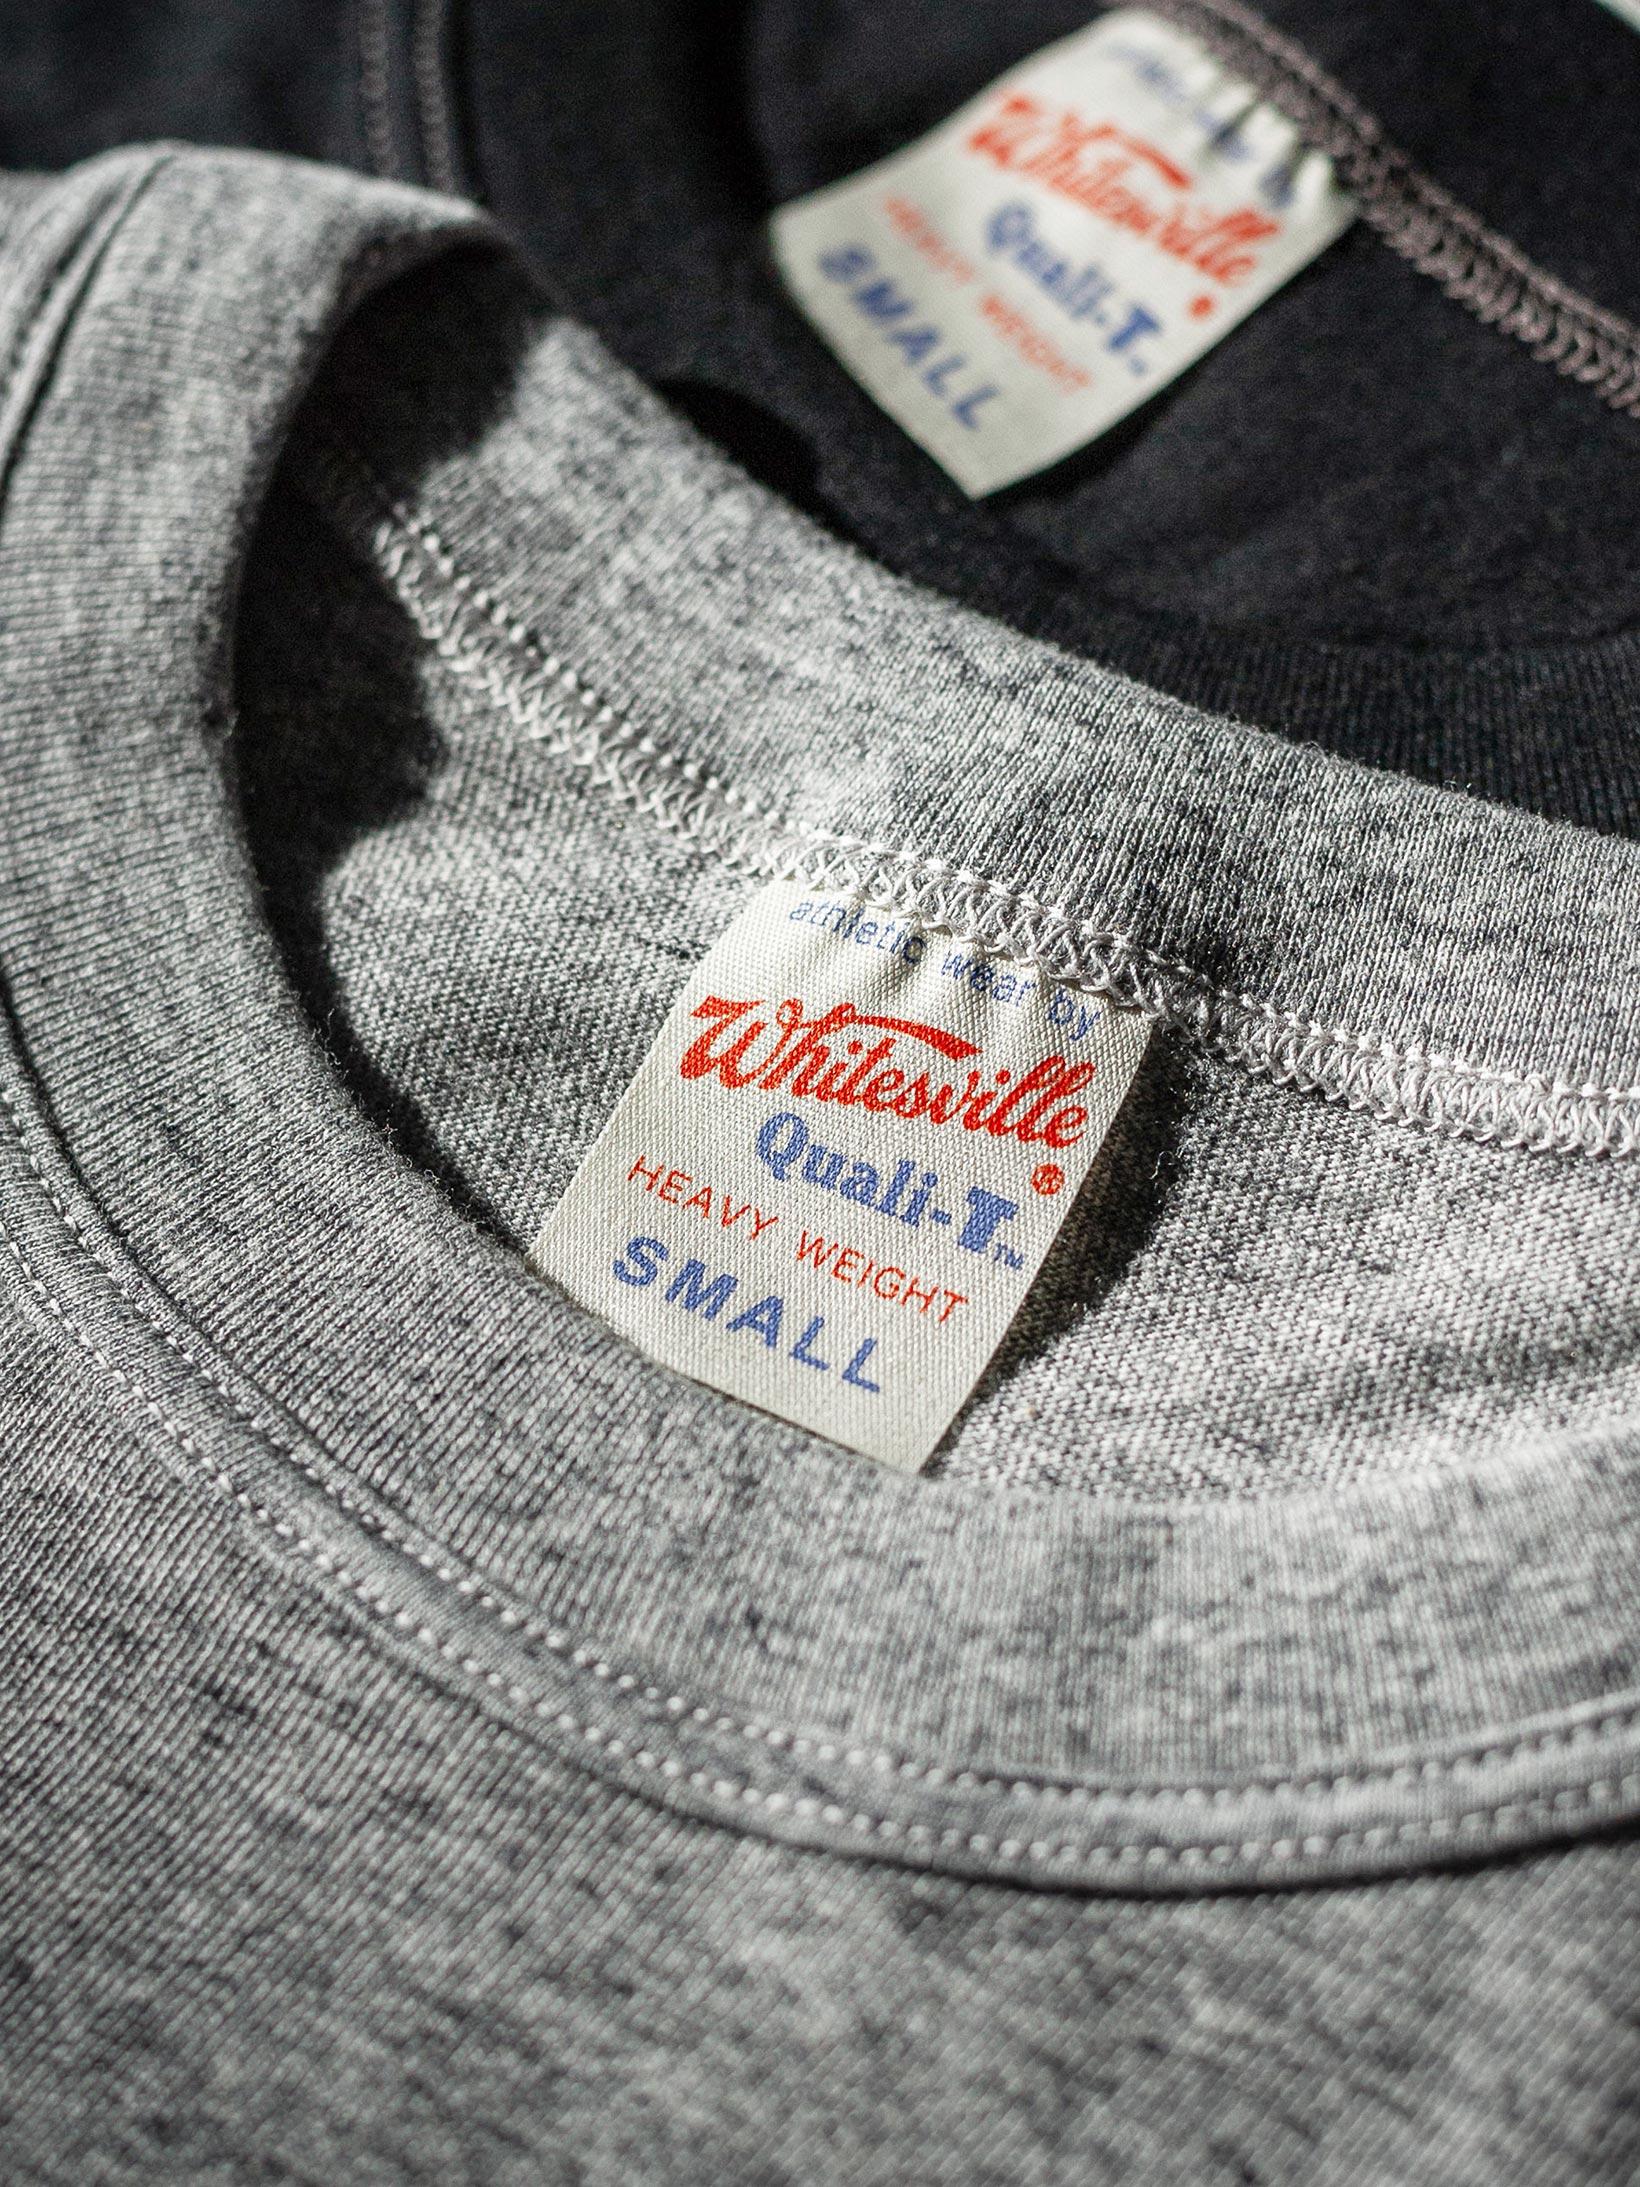 Whitesville Japanese Made T-Shirts - White (2-Pack) - Image 8